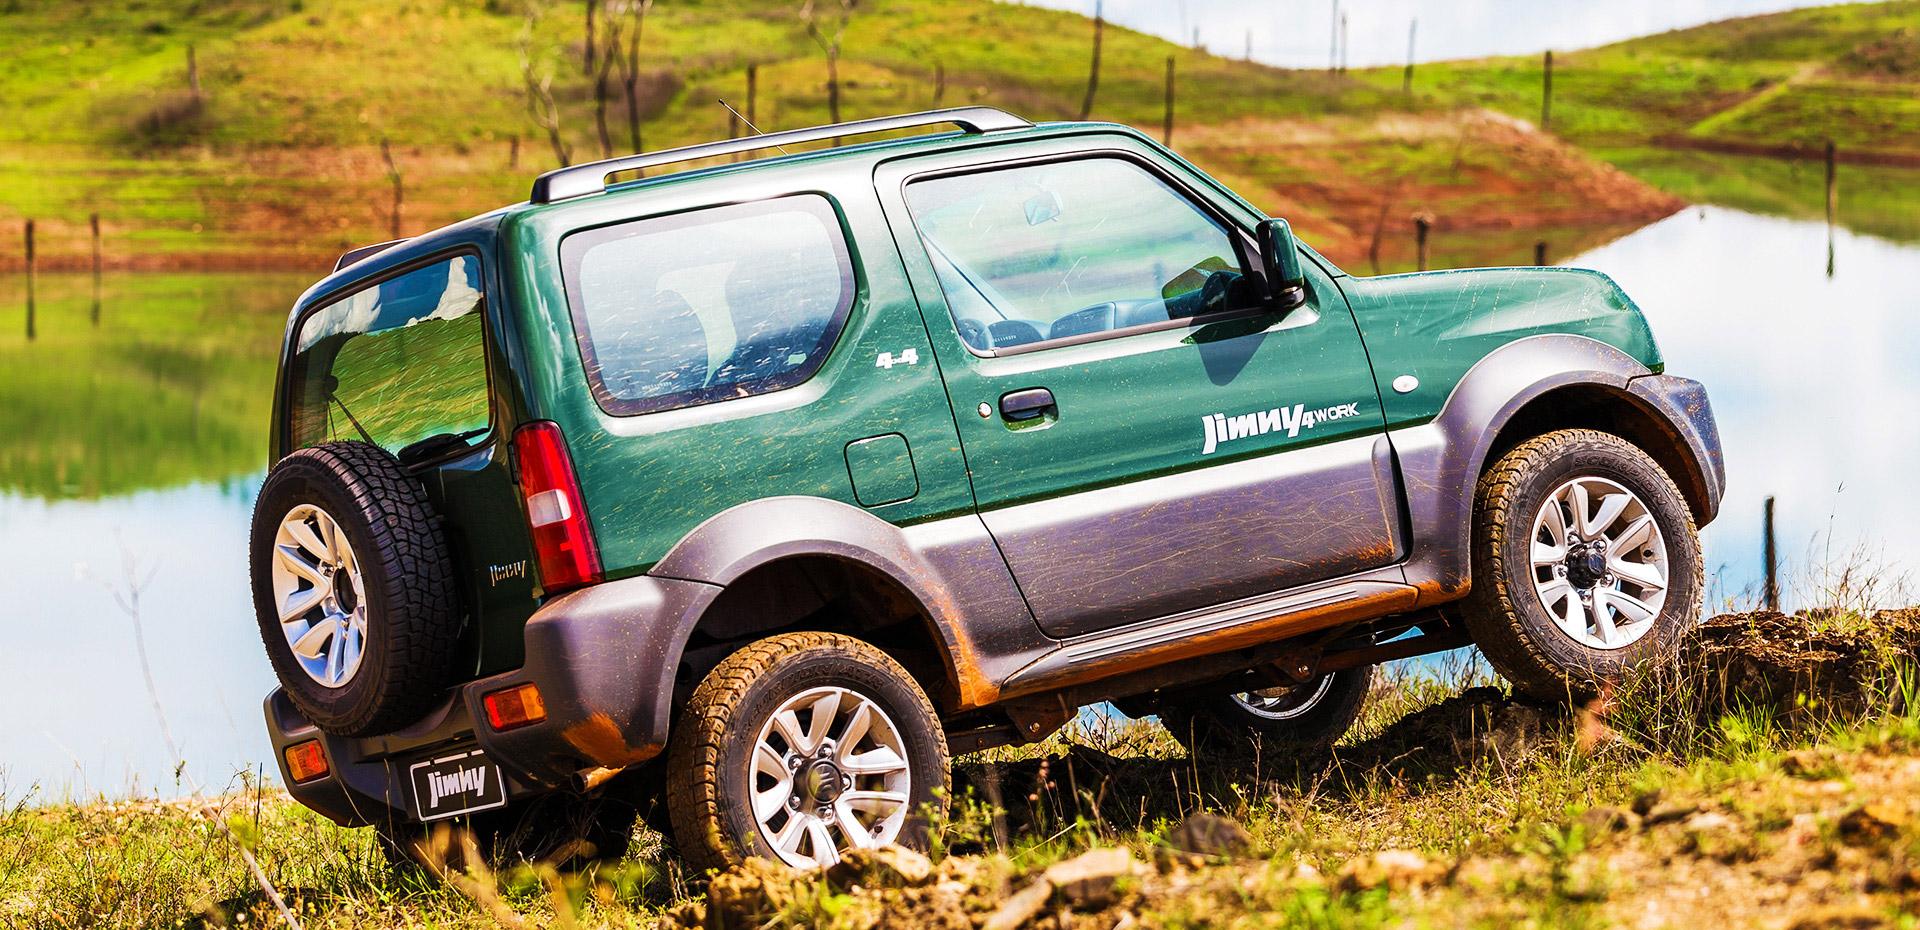 Suzuki JIMNY 4WORK 9